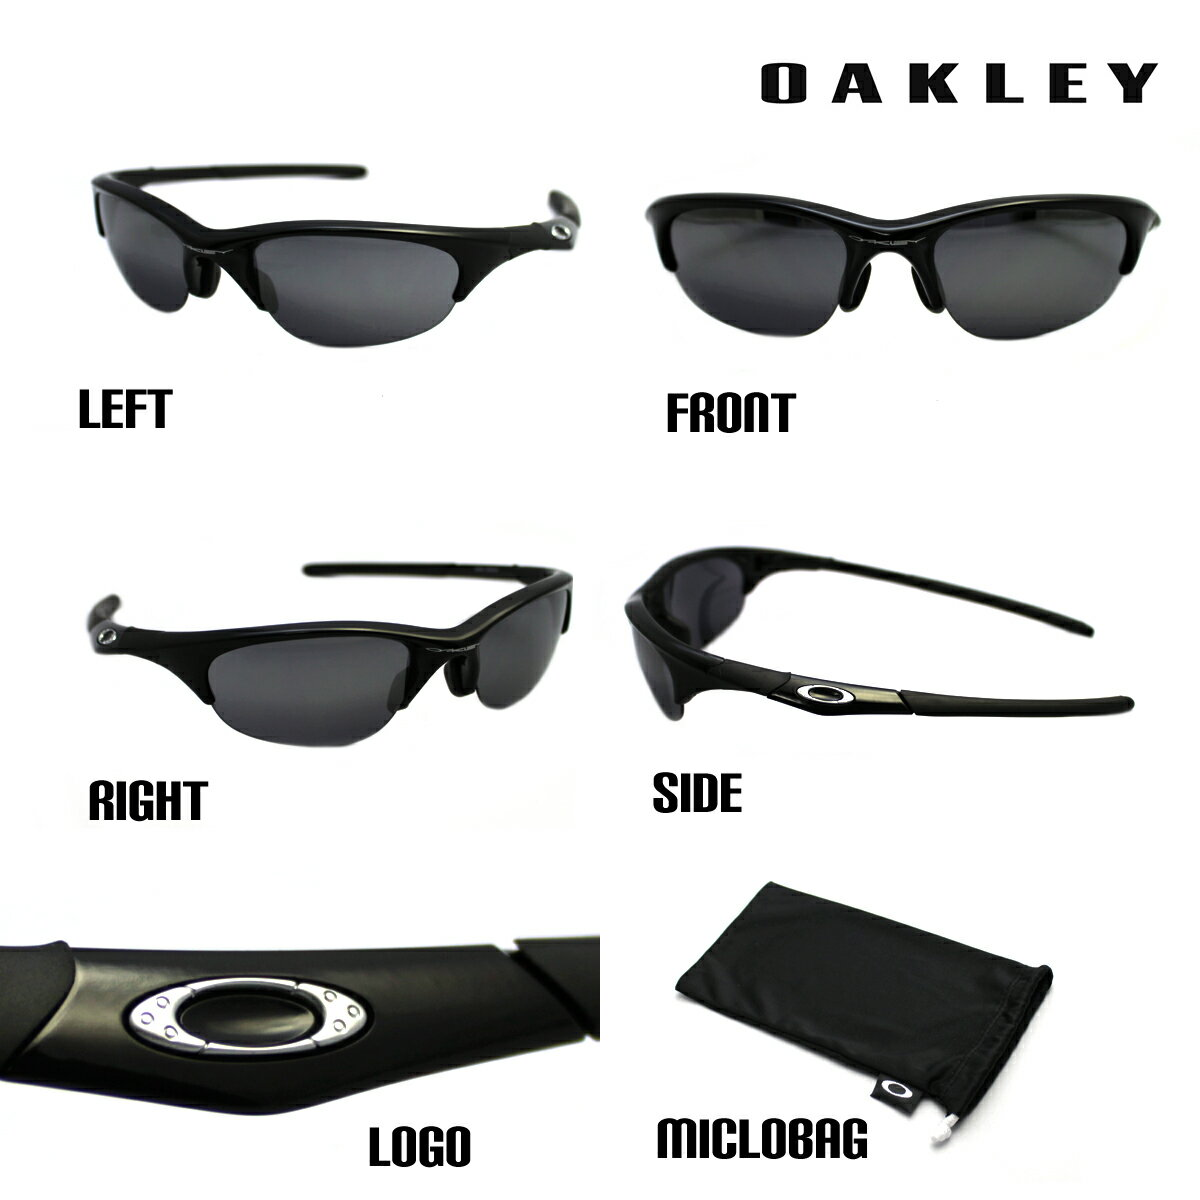 Oakley Jury Sunglasses Replacement Parts Louisiana